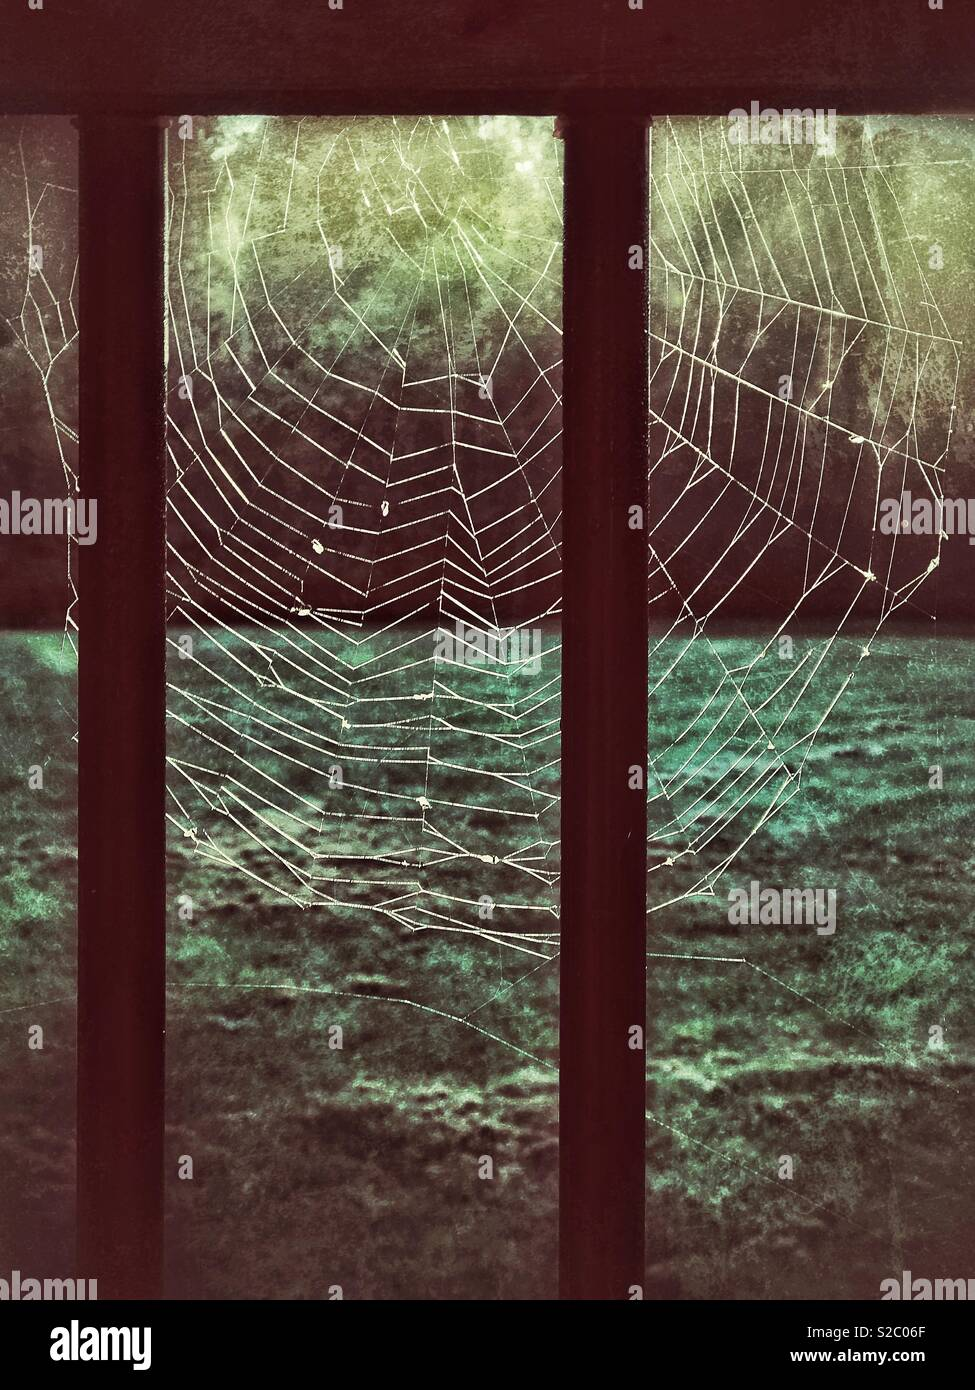 Spiderweb illuminated by light - Stock Image